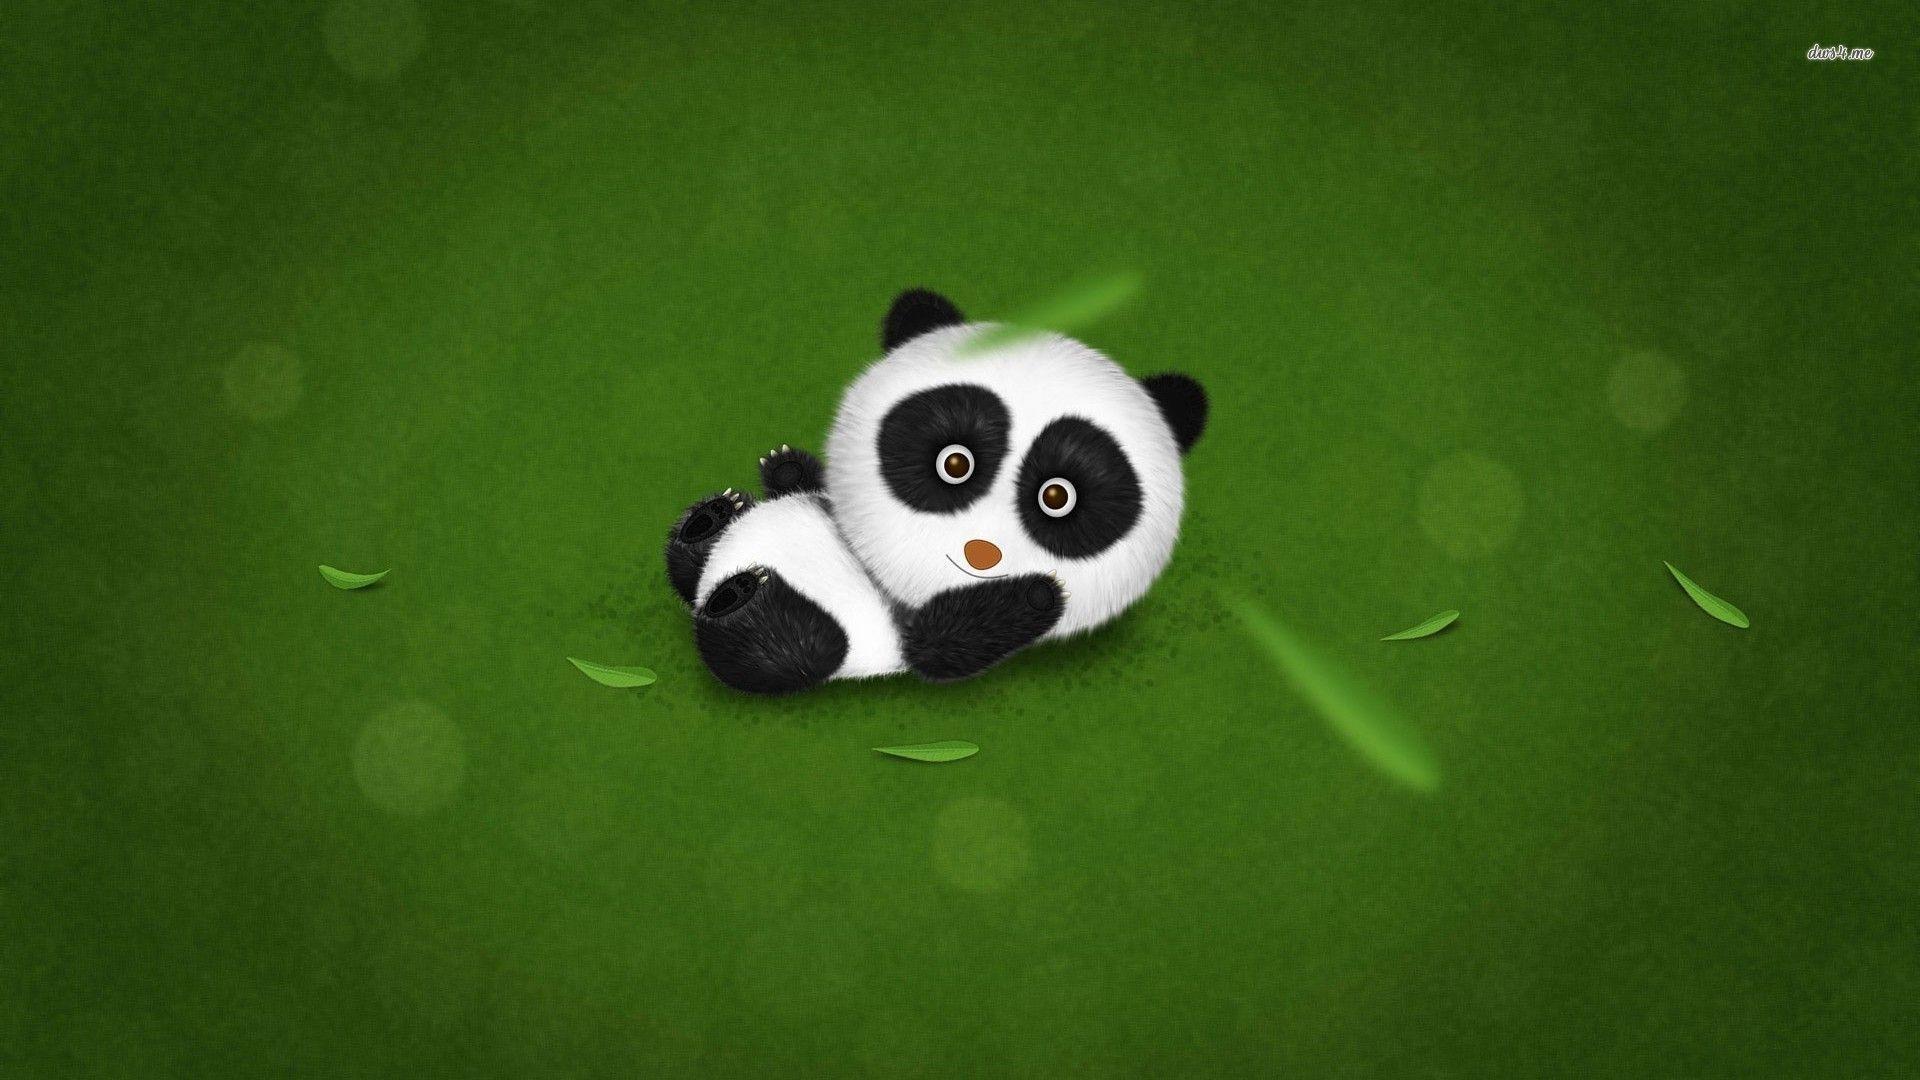 Baby Panda Wallpapers Wallpapertag